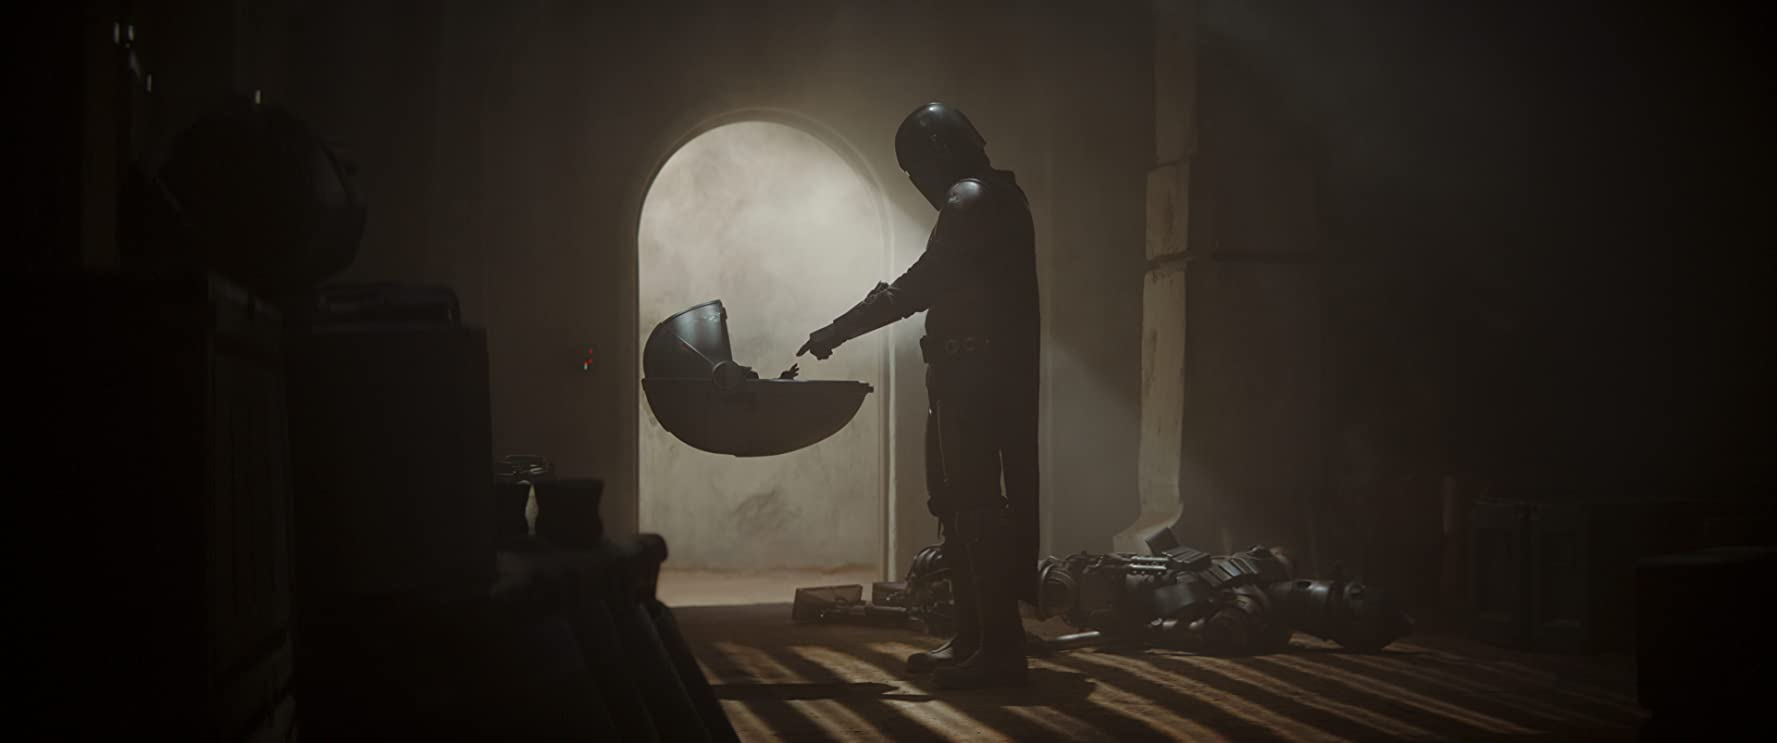 Pedro Pascal in The Mandalorian (2019)